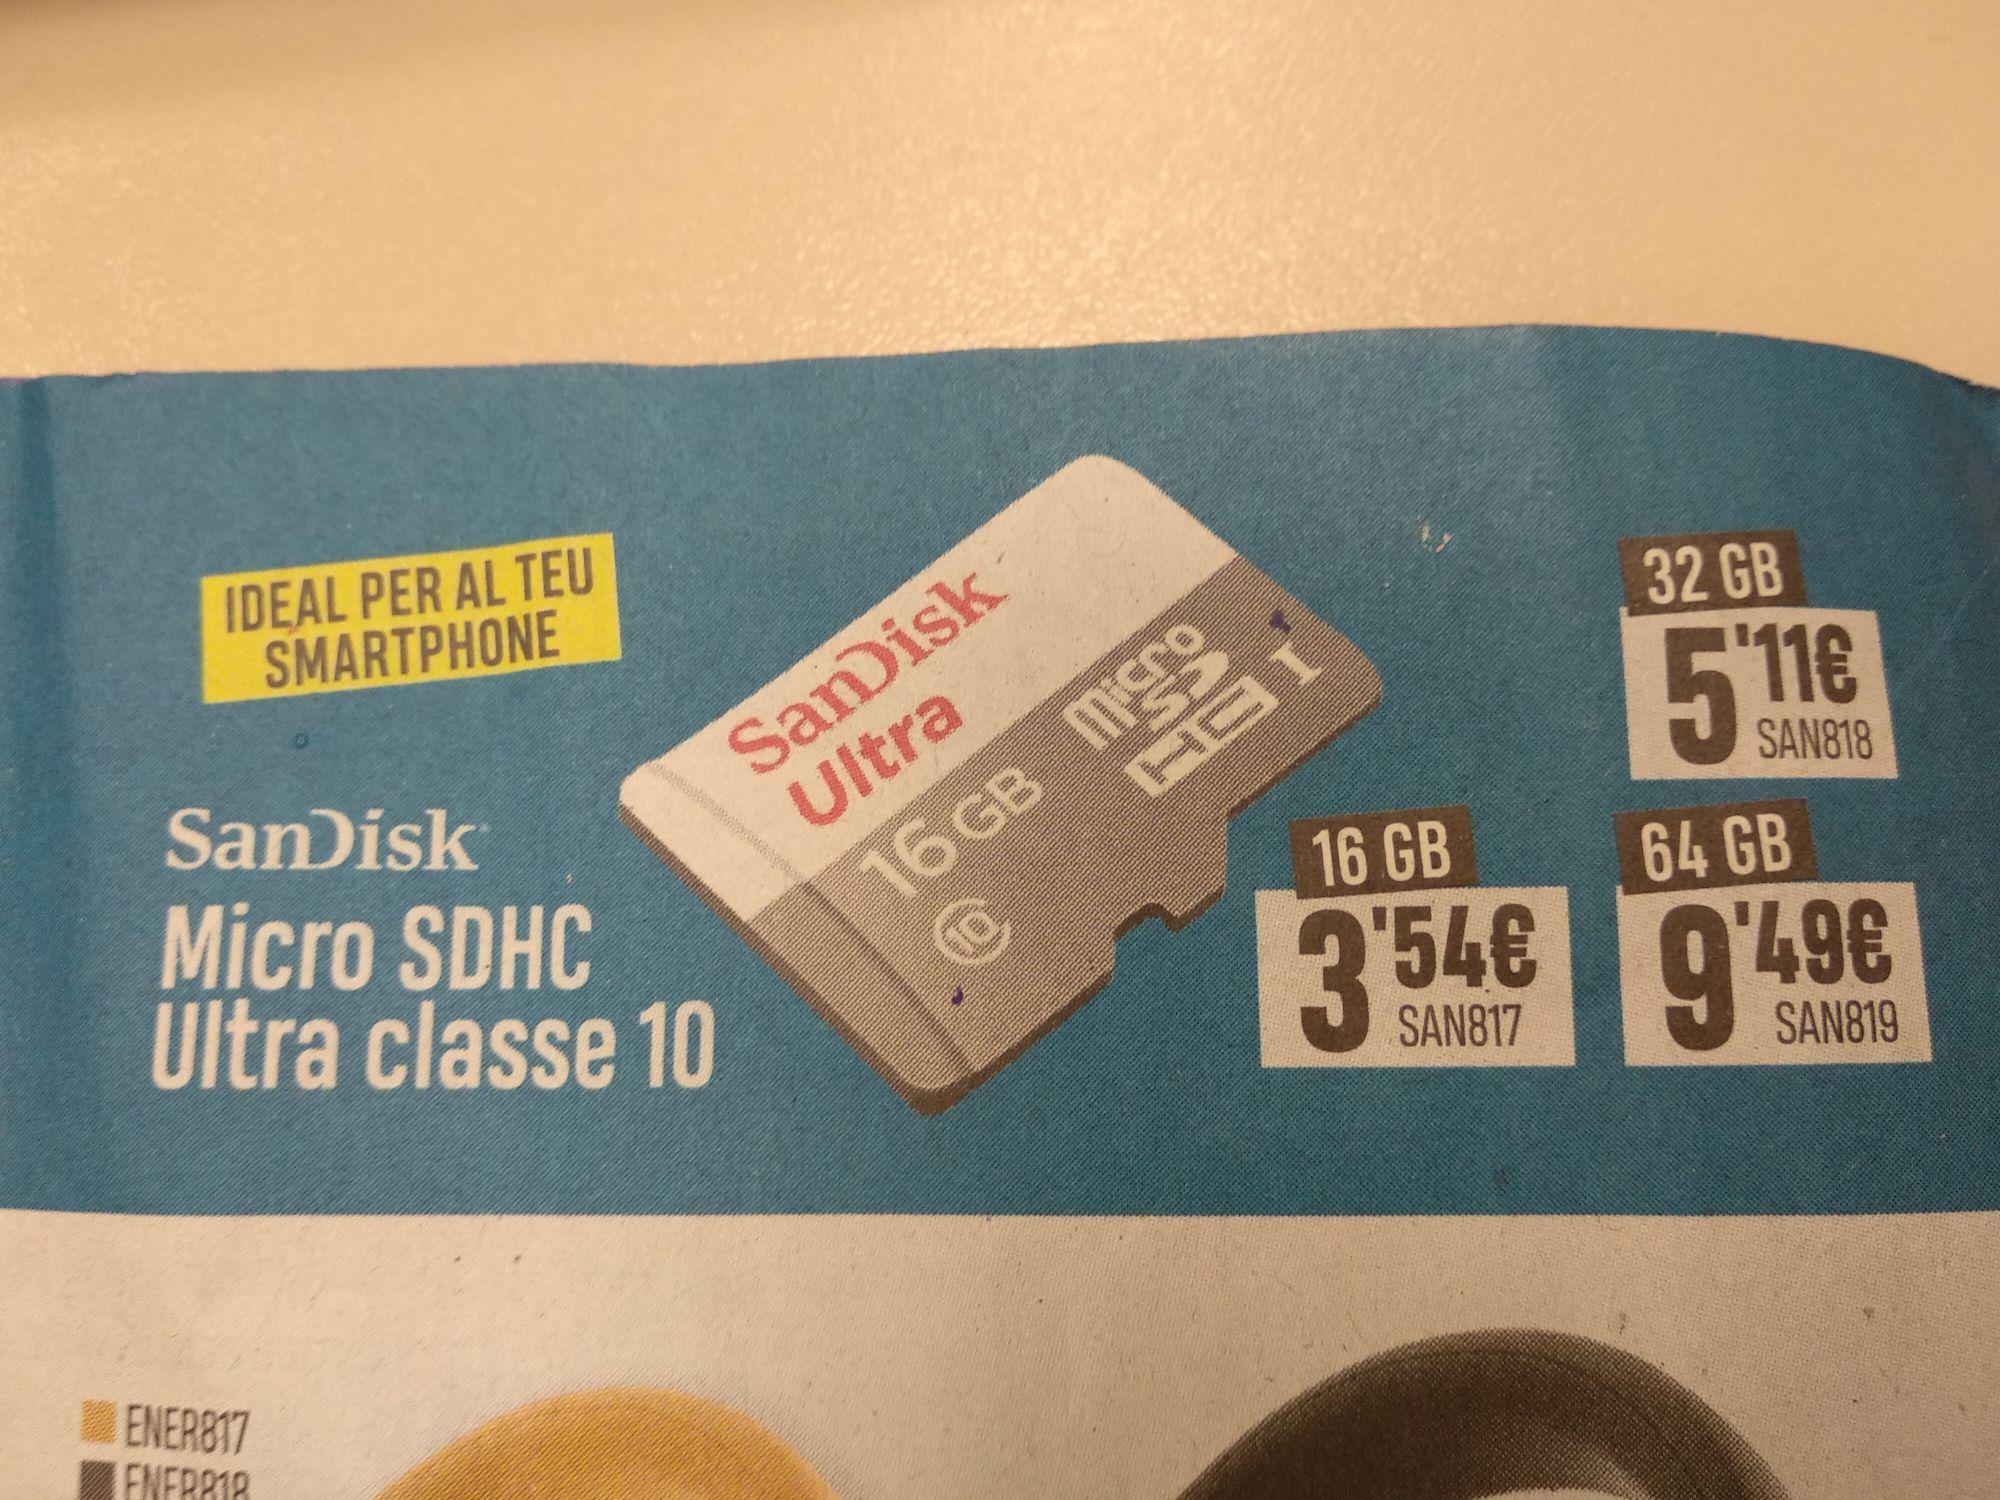 Tarjeta micro SD ScanDisk por menos de 10€